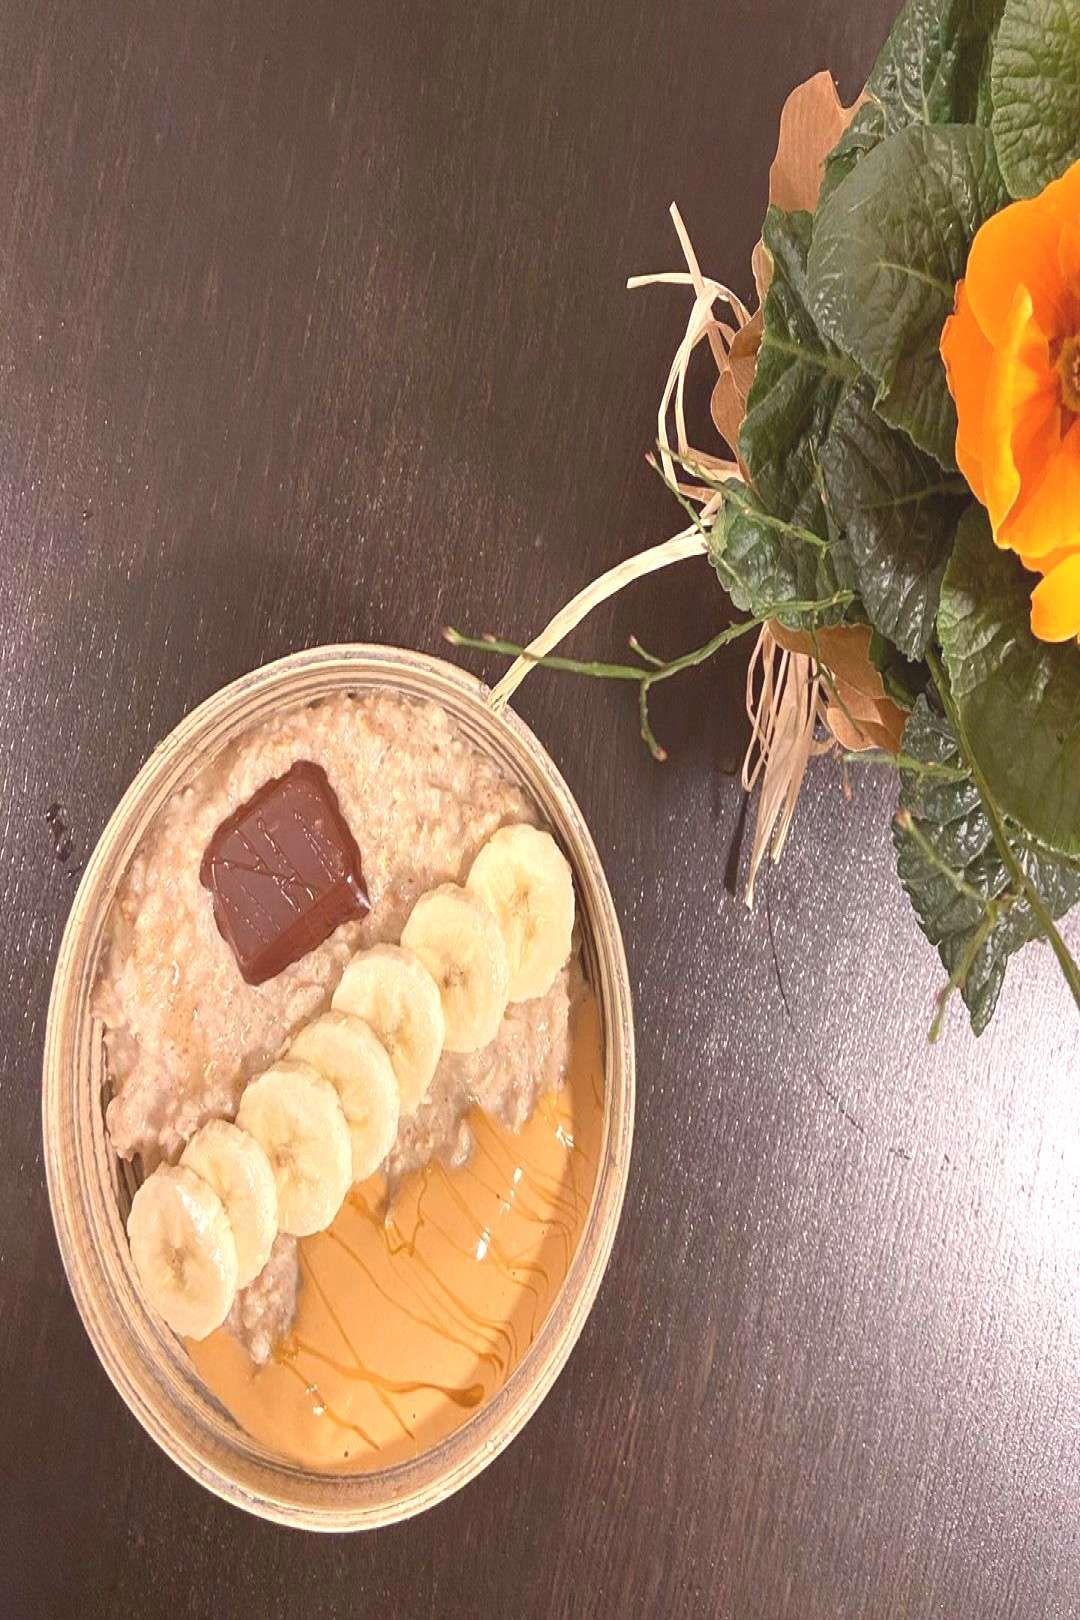 #oatmealbowl #cauliflower #cinnamon #versio #lower #with #carb #food #and #for #a Oatmealbowl with cinnamon and cauliflower for a lower carb versioYou can find Breakfast ideas and more on our website.Oatmealbowl with cinnamon an...